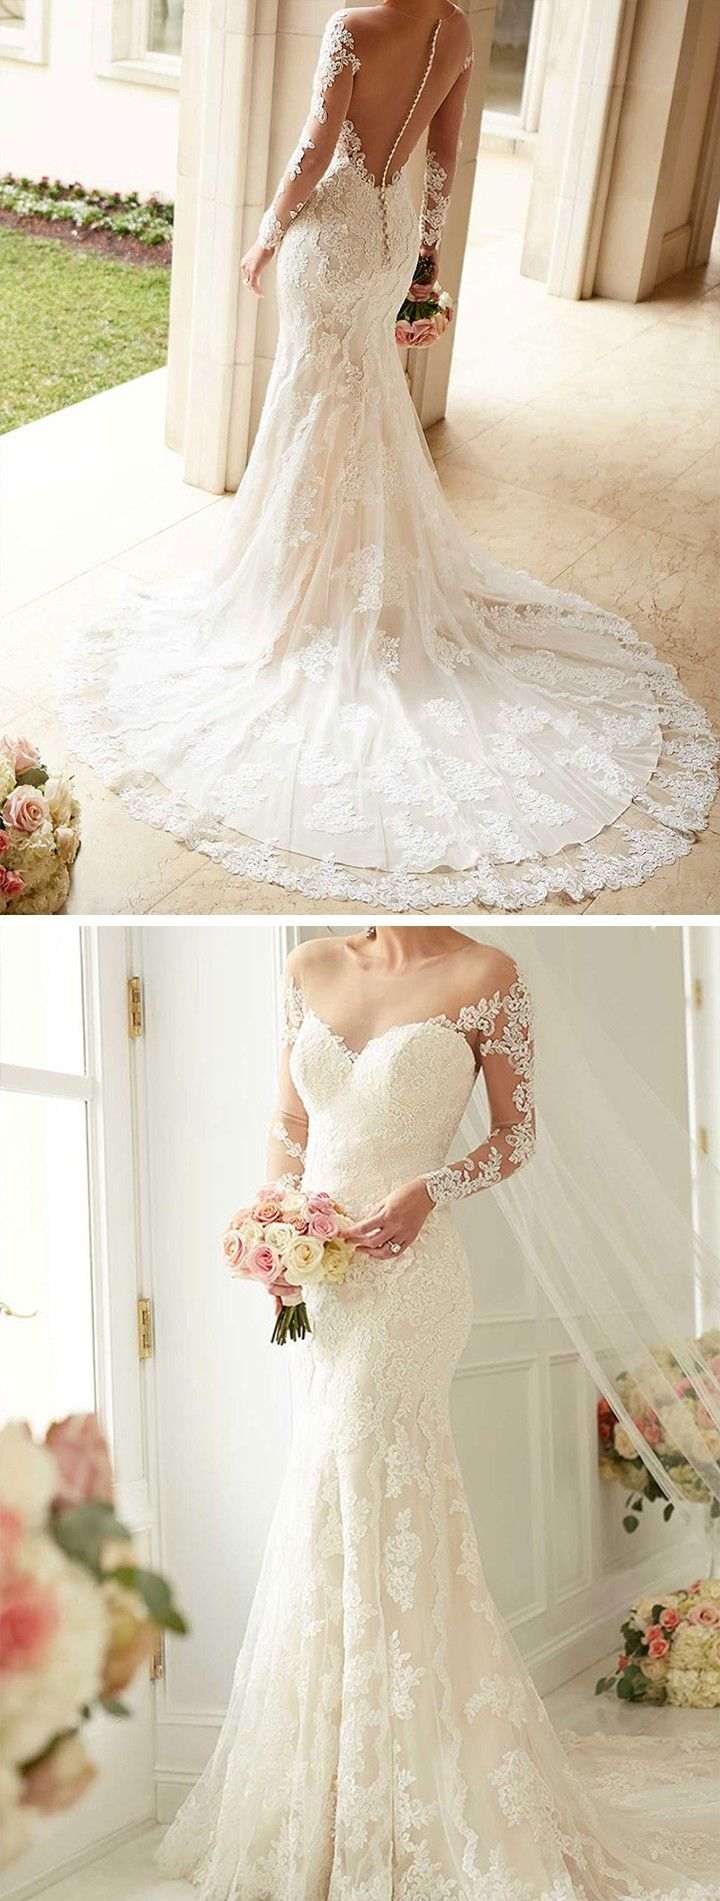 Boat neck lace wedding dress october 2018  best Christian wedding dress images on Pinterest  Groom attire